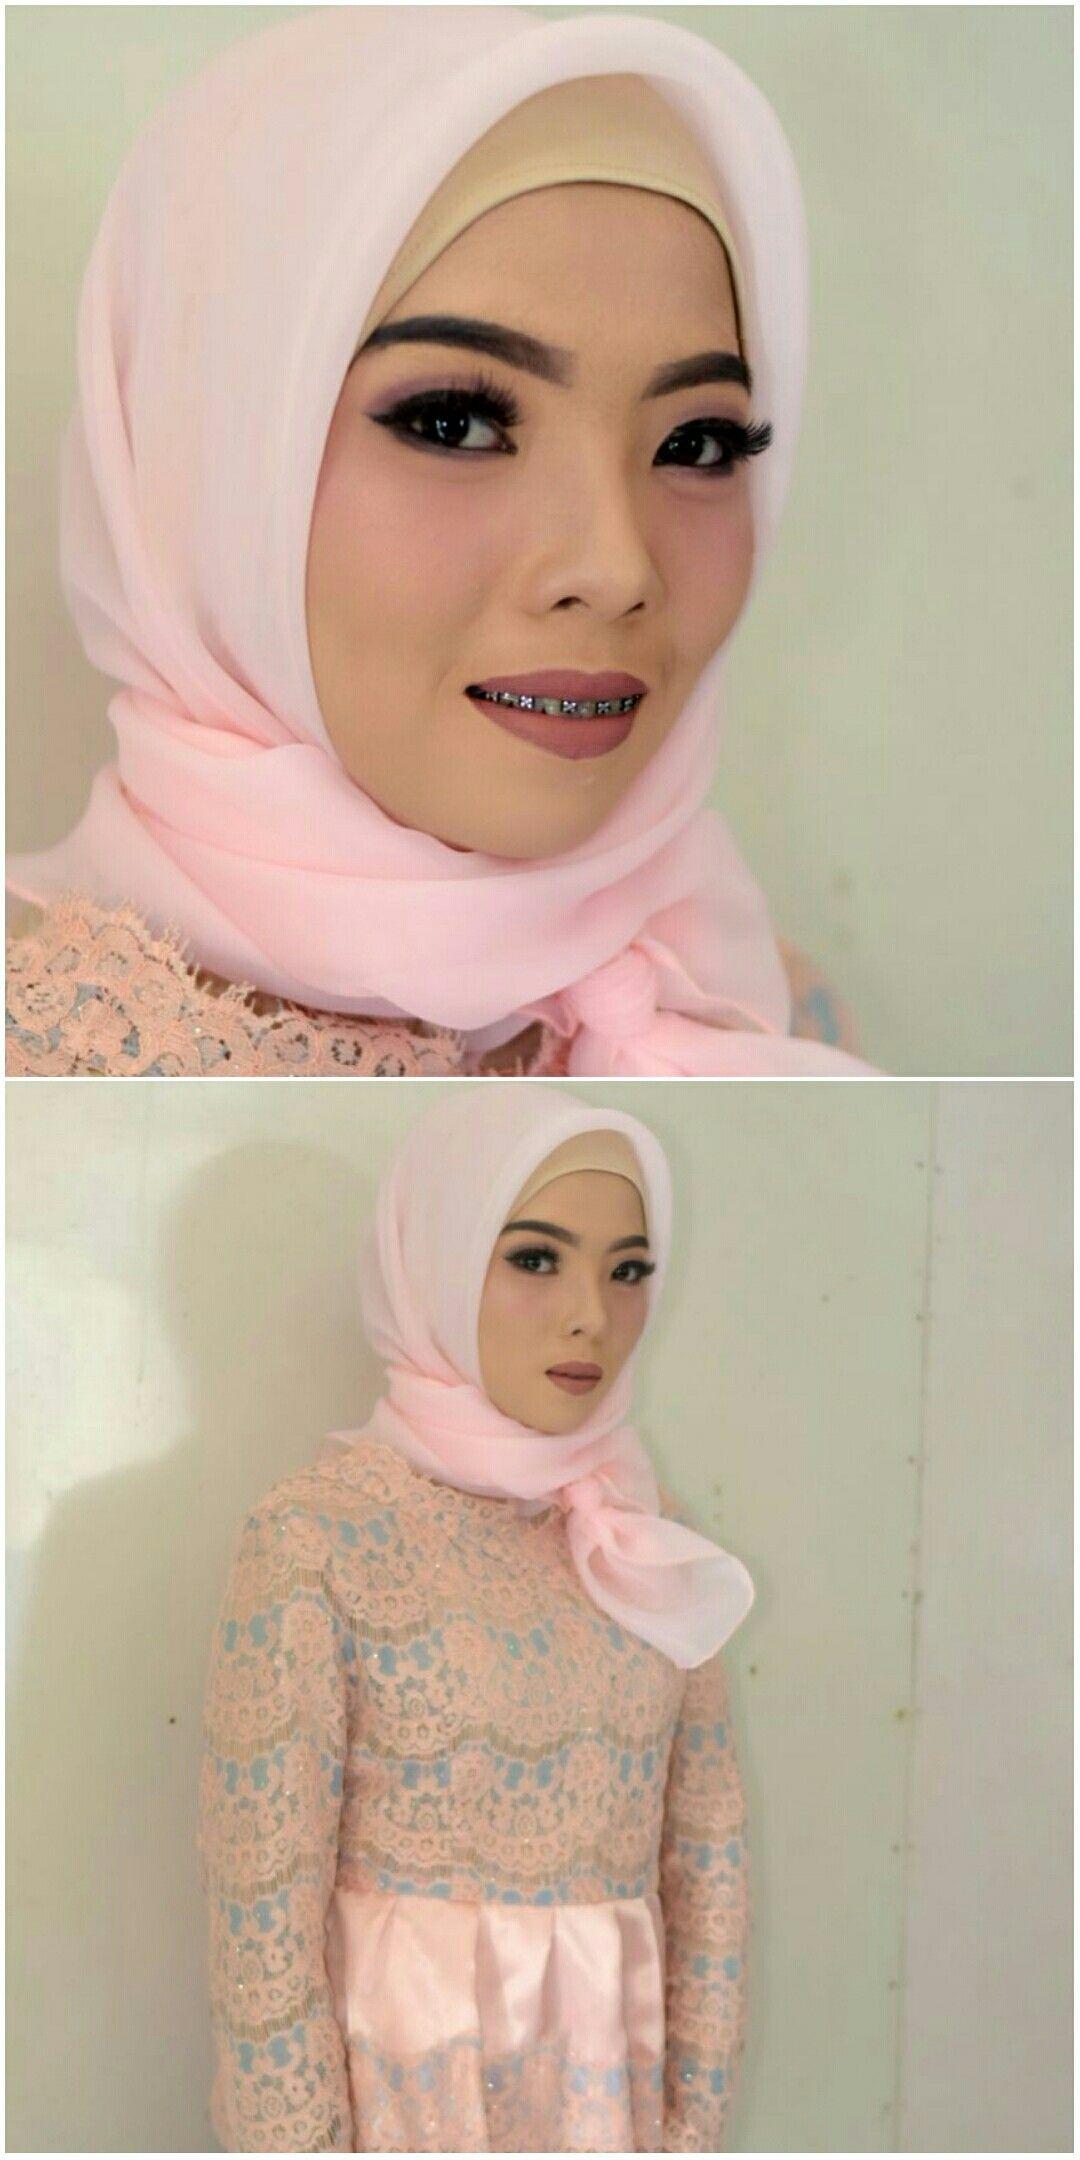 Graduation Makeup Muntilan Magelang Jogja Yogyakarta Artist Mua Rias Perias Hijab Muslim Wisuda Pengantin Make Up Putri